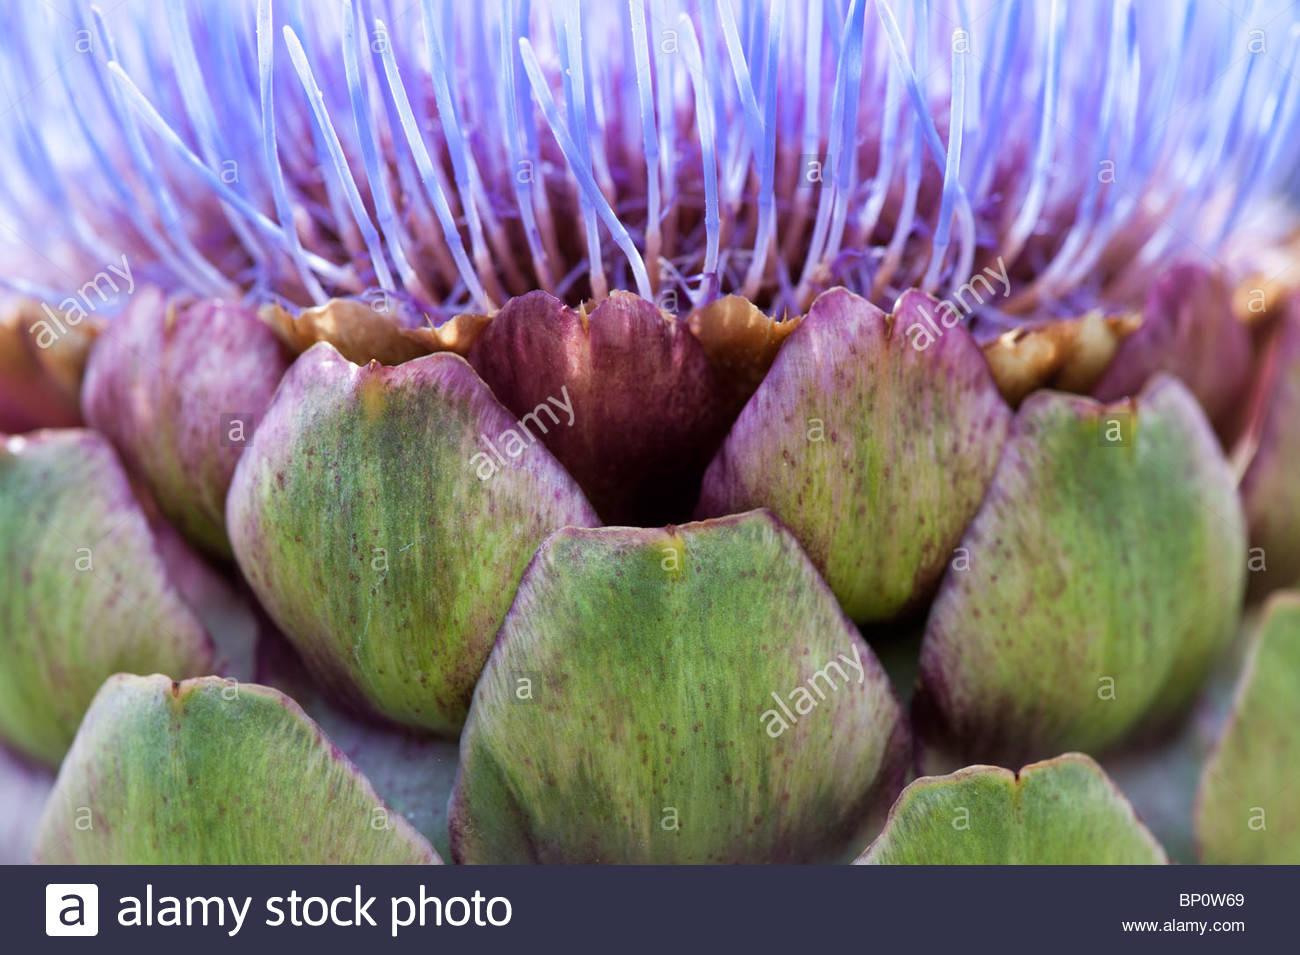 Cynara Scolymus. Globe artichoke flower - Stock Image